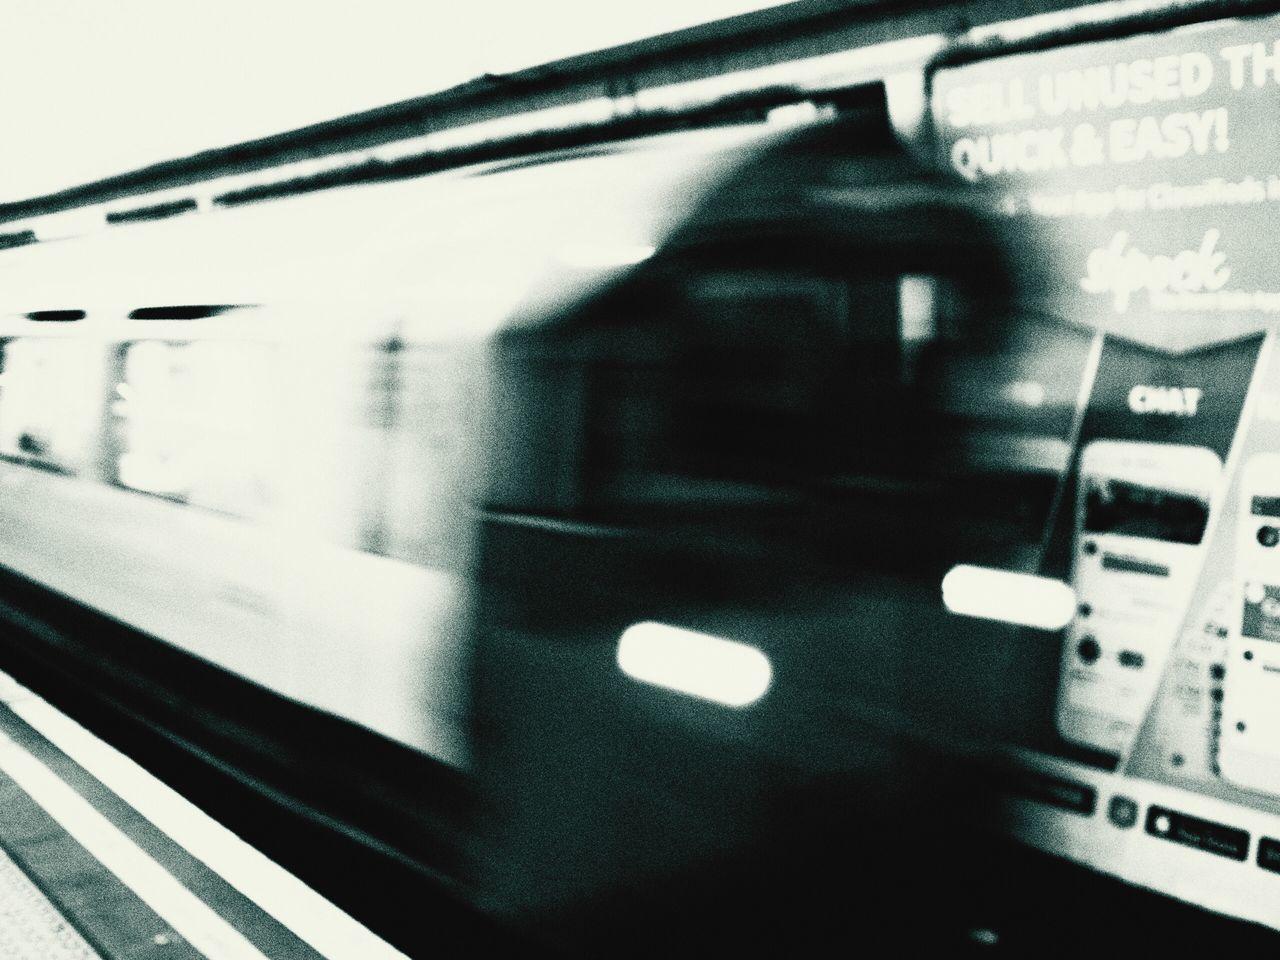 transportation, train - vehicle, no people, indoors, technology, close-up, illuminated, day